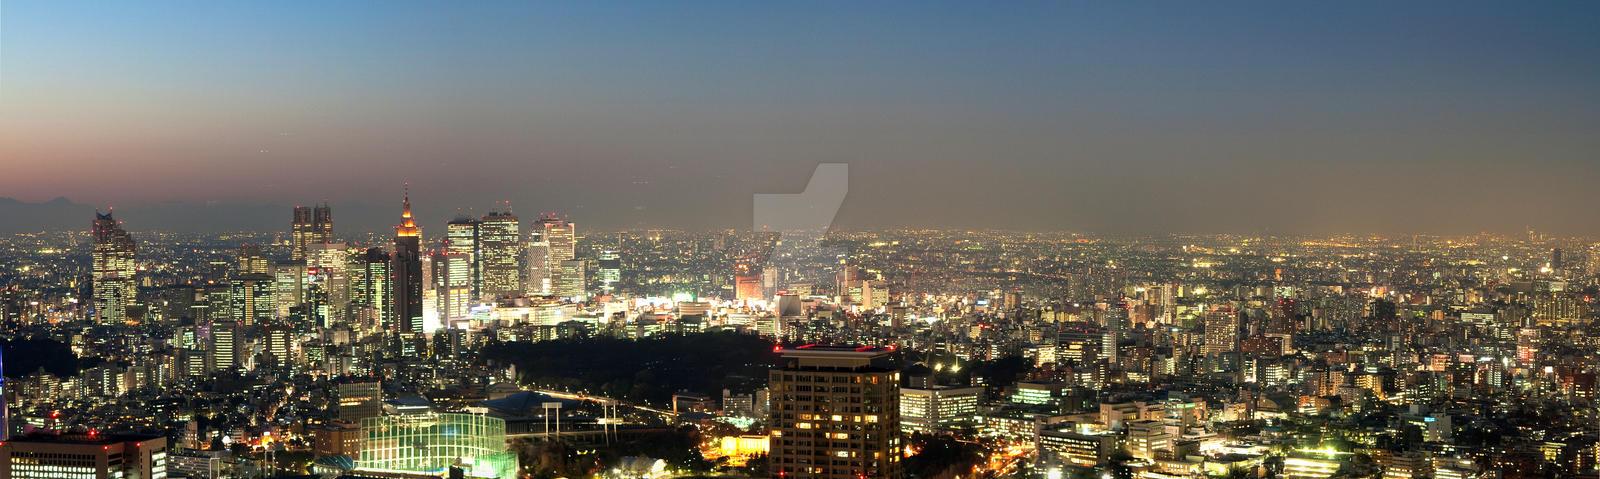 Shinjuku Tokyo Night Panorama by Keith-Killer